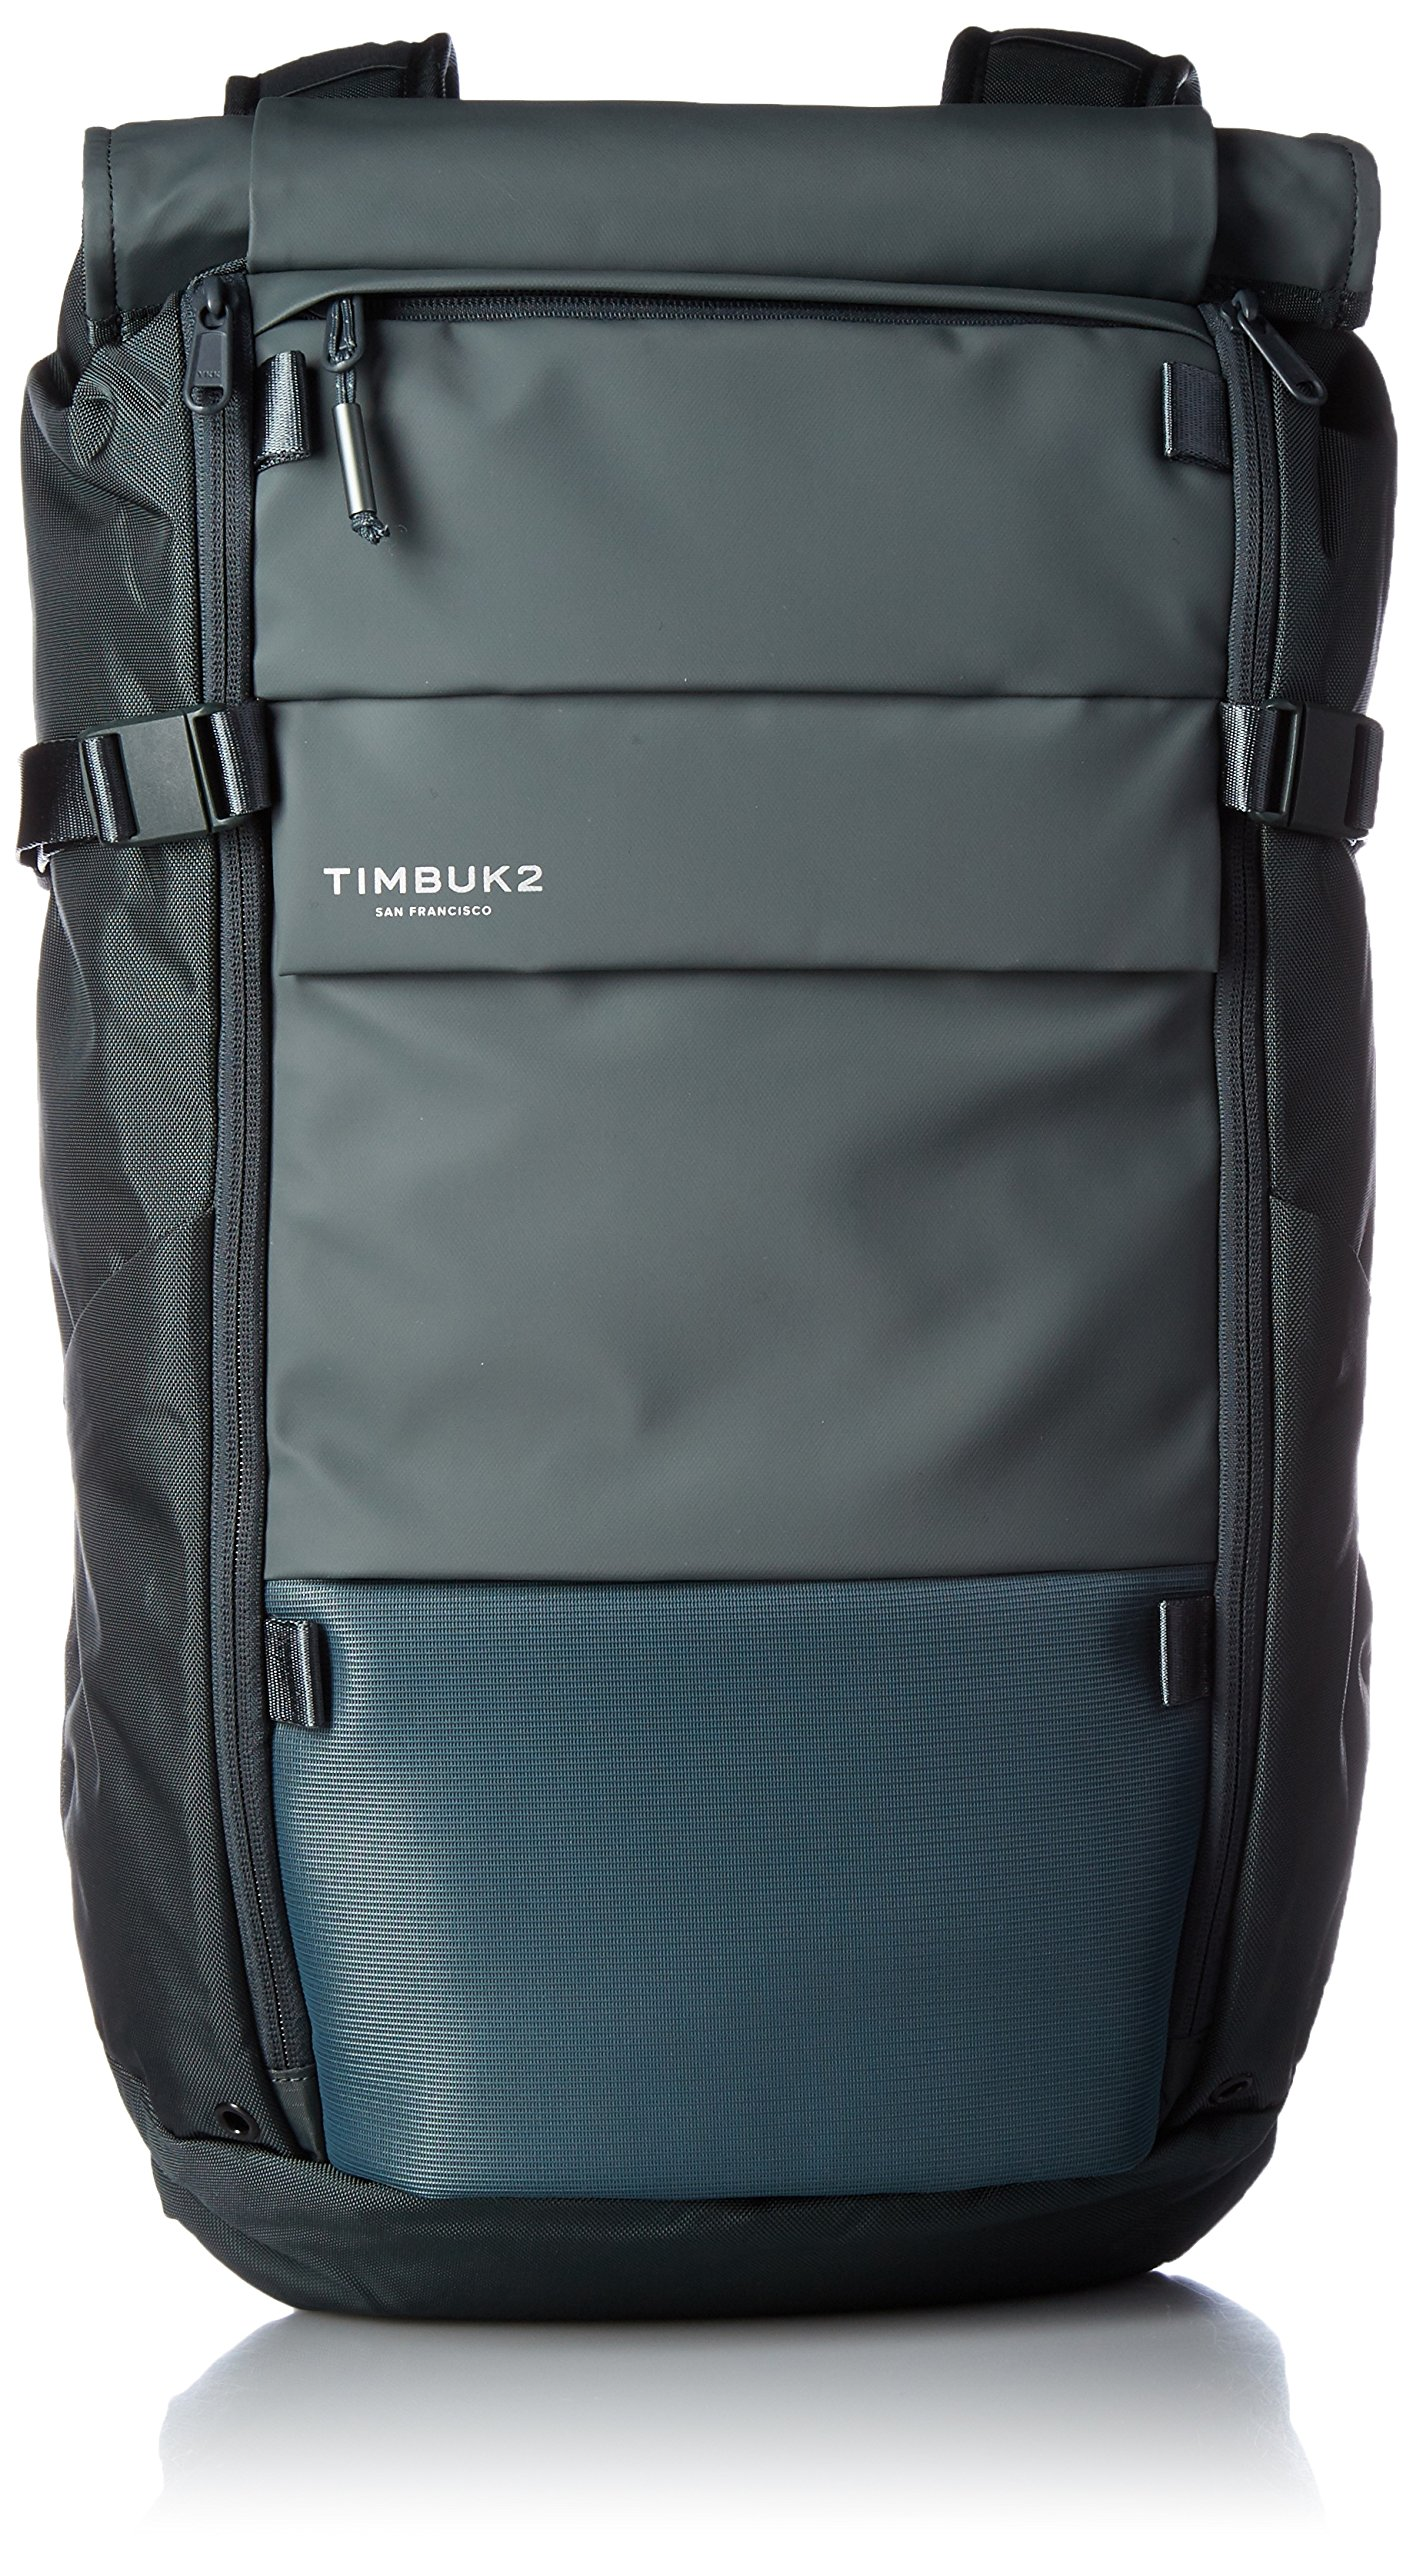 Timbuk2 Clark Pack, Surplus, One Size by Timbuk2